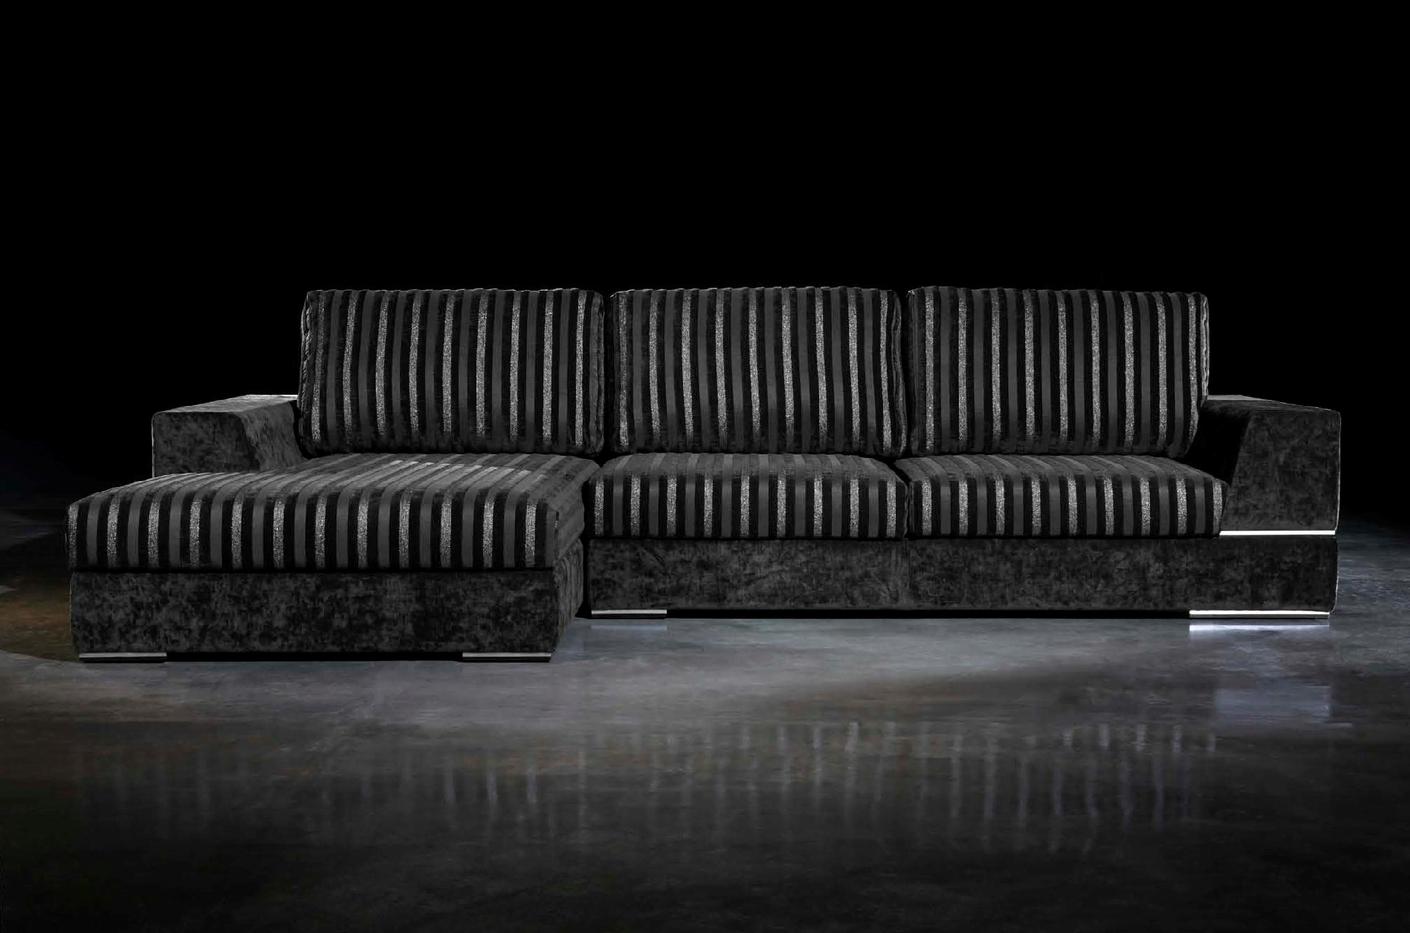 Couch_Greek_M_Campos_Silva_Vinhal_1.png